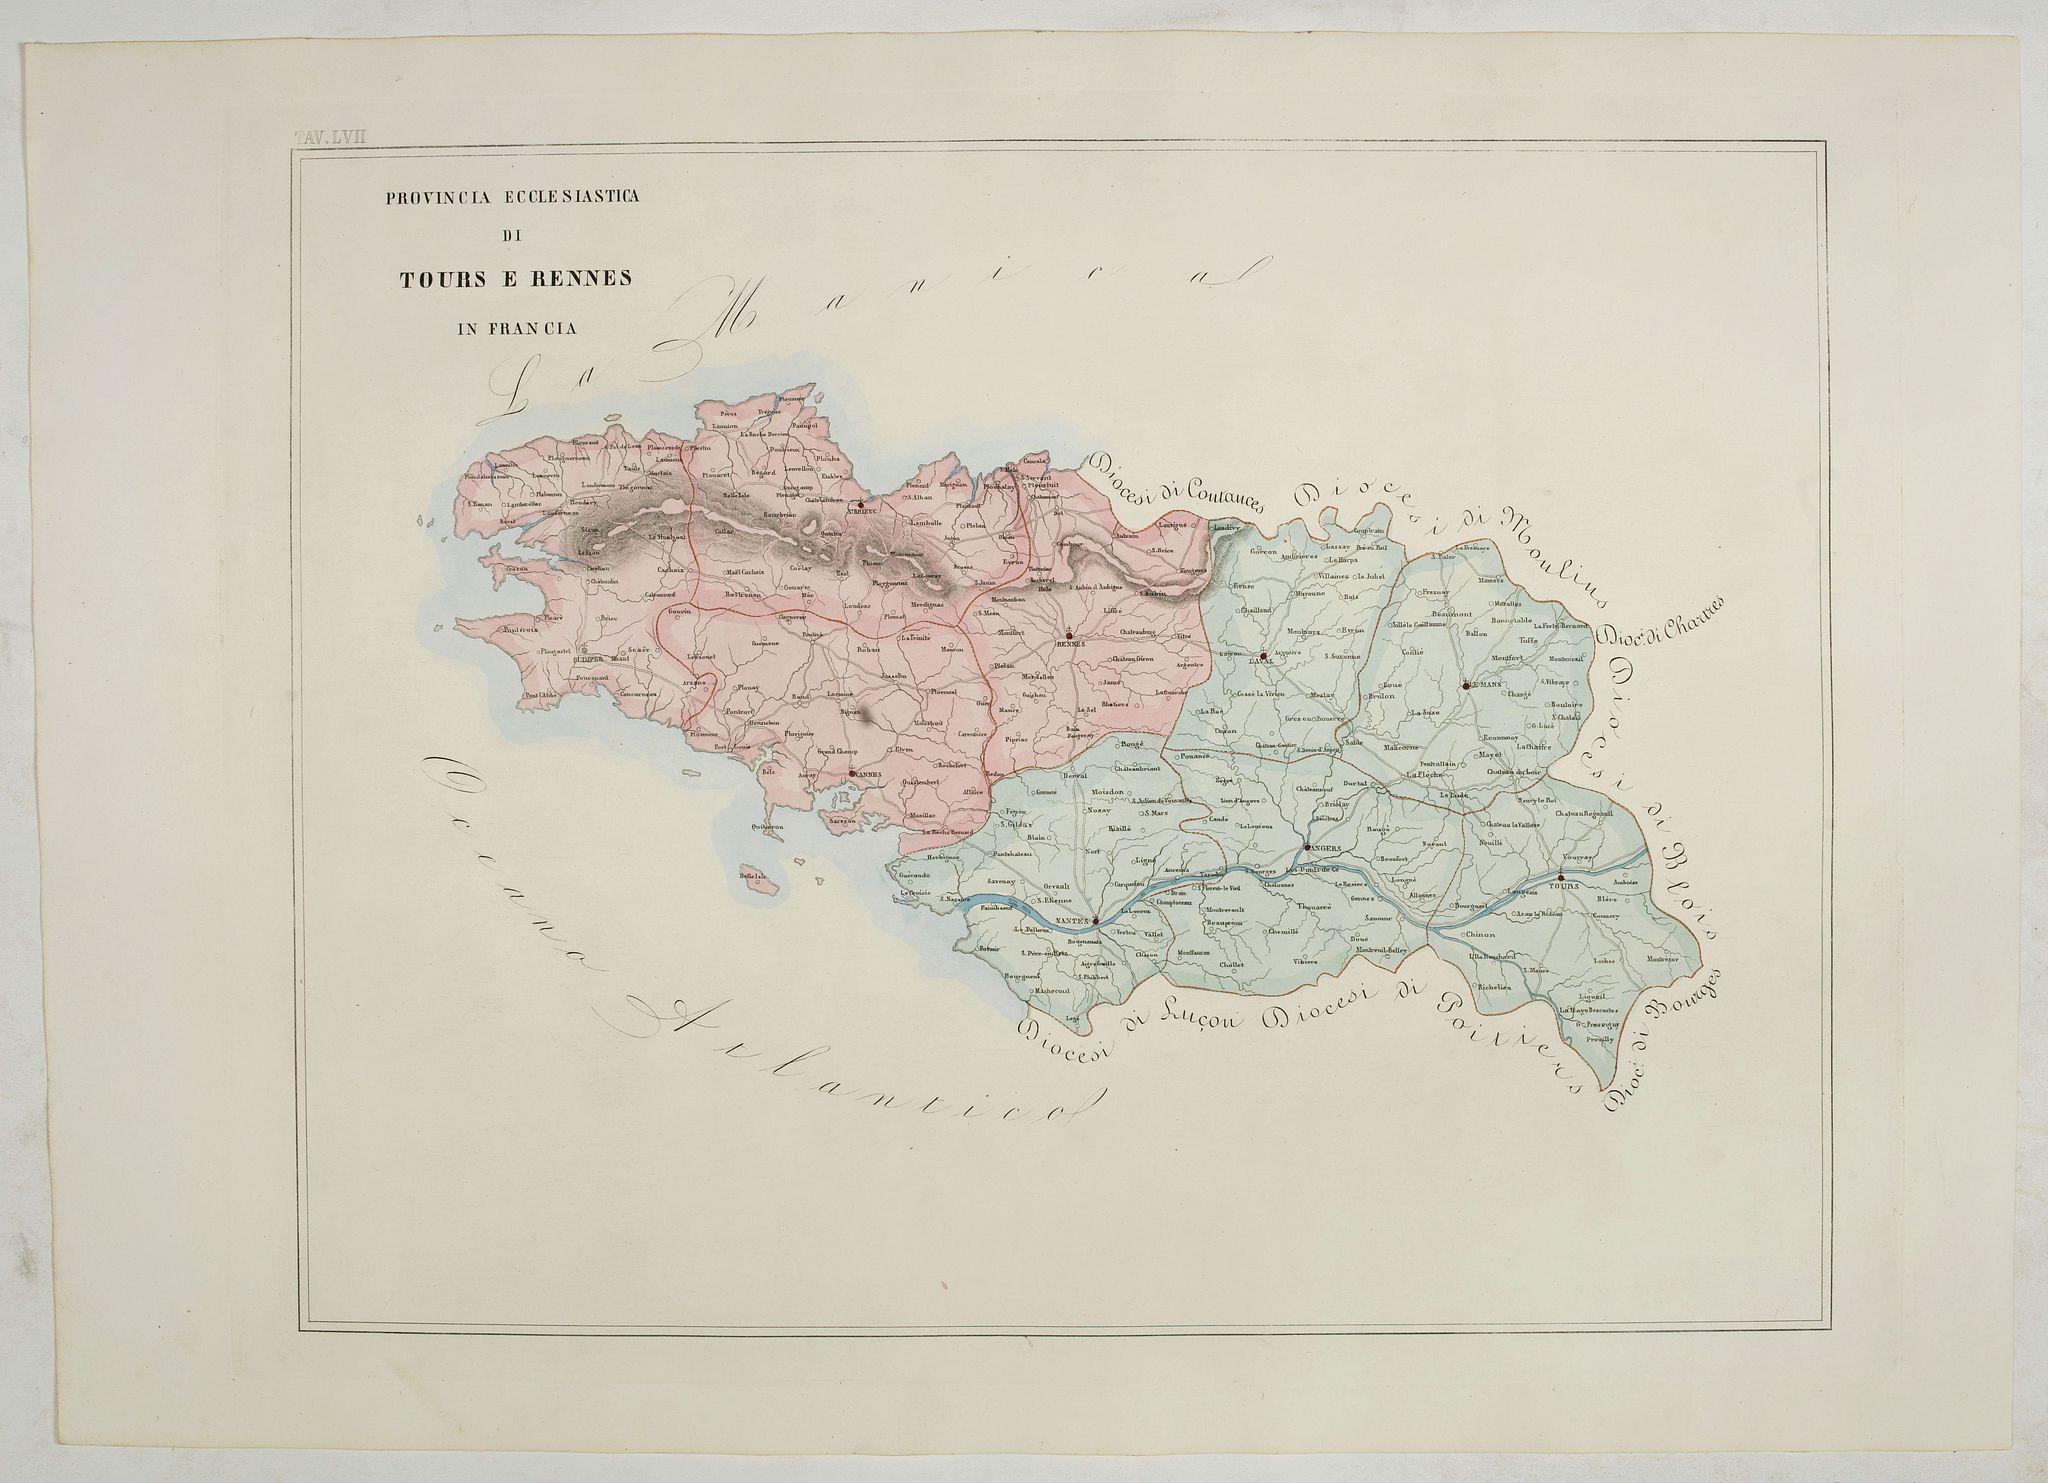 PETRI  Girolamo -  Province ecclesiastica di Tours e Rennes in Francia (Tav LVII)